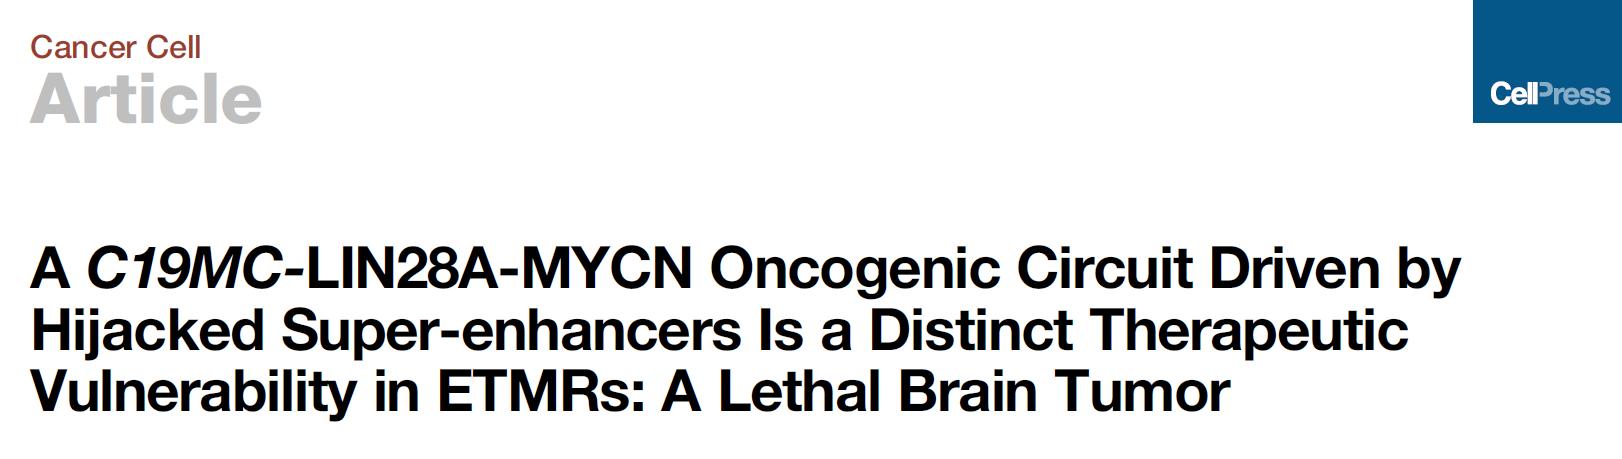 Cancer Cell: 超级增强子驱动致命性儿童脑瘤发展!图